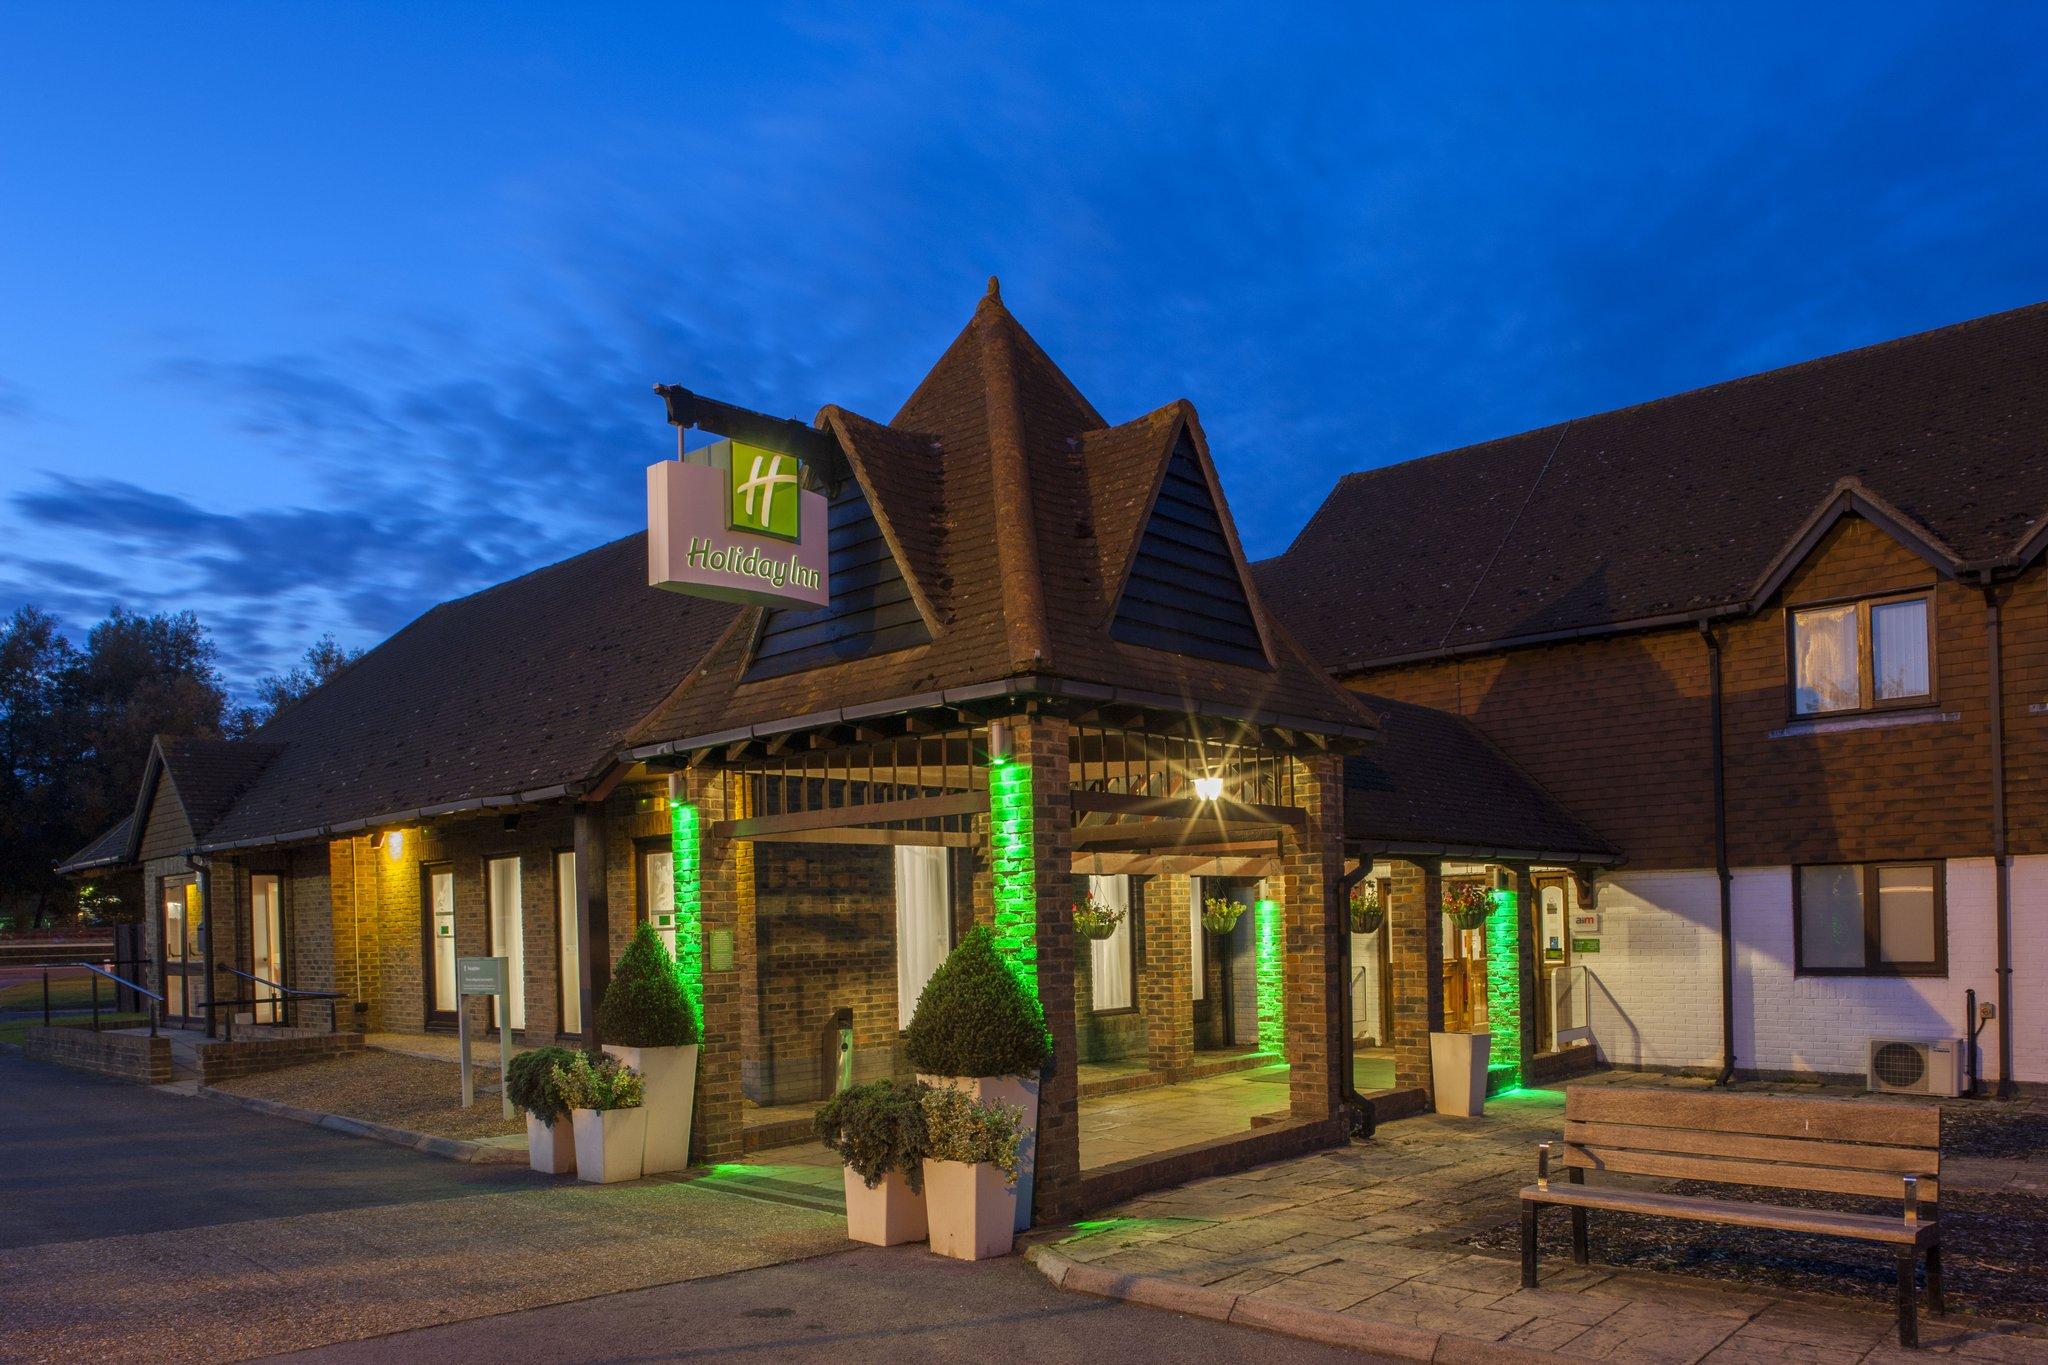 Holiday Inn Ashford Central hotel